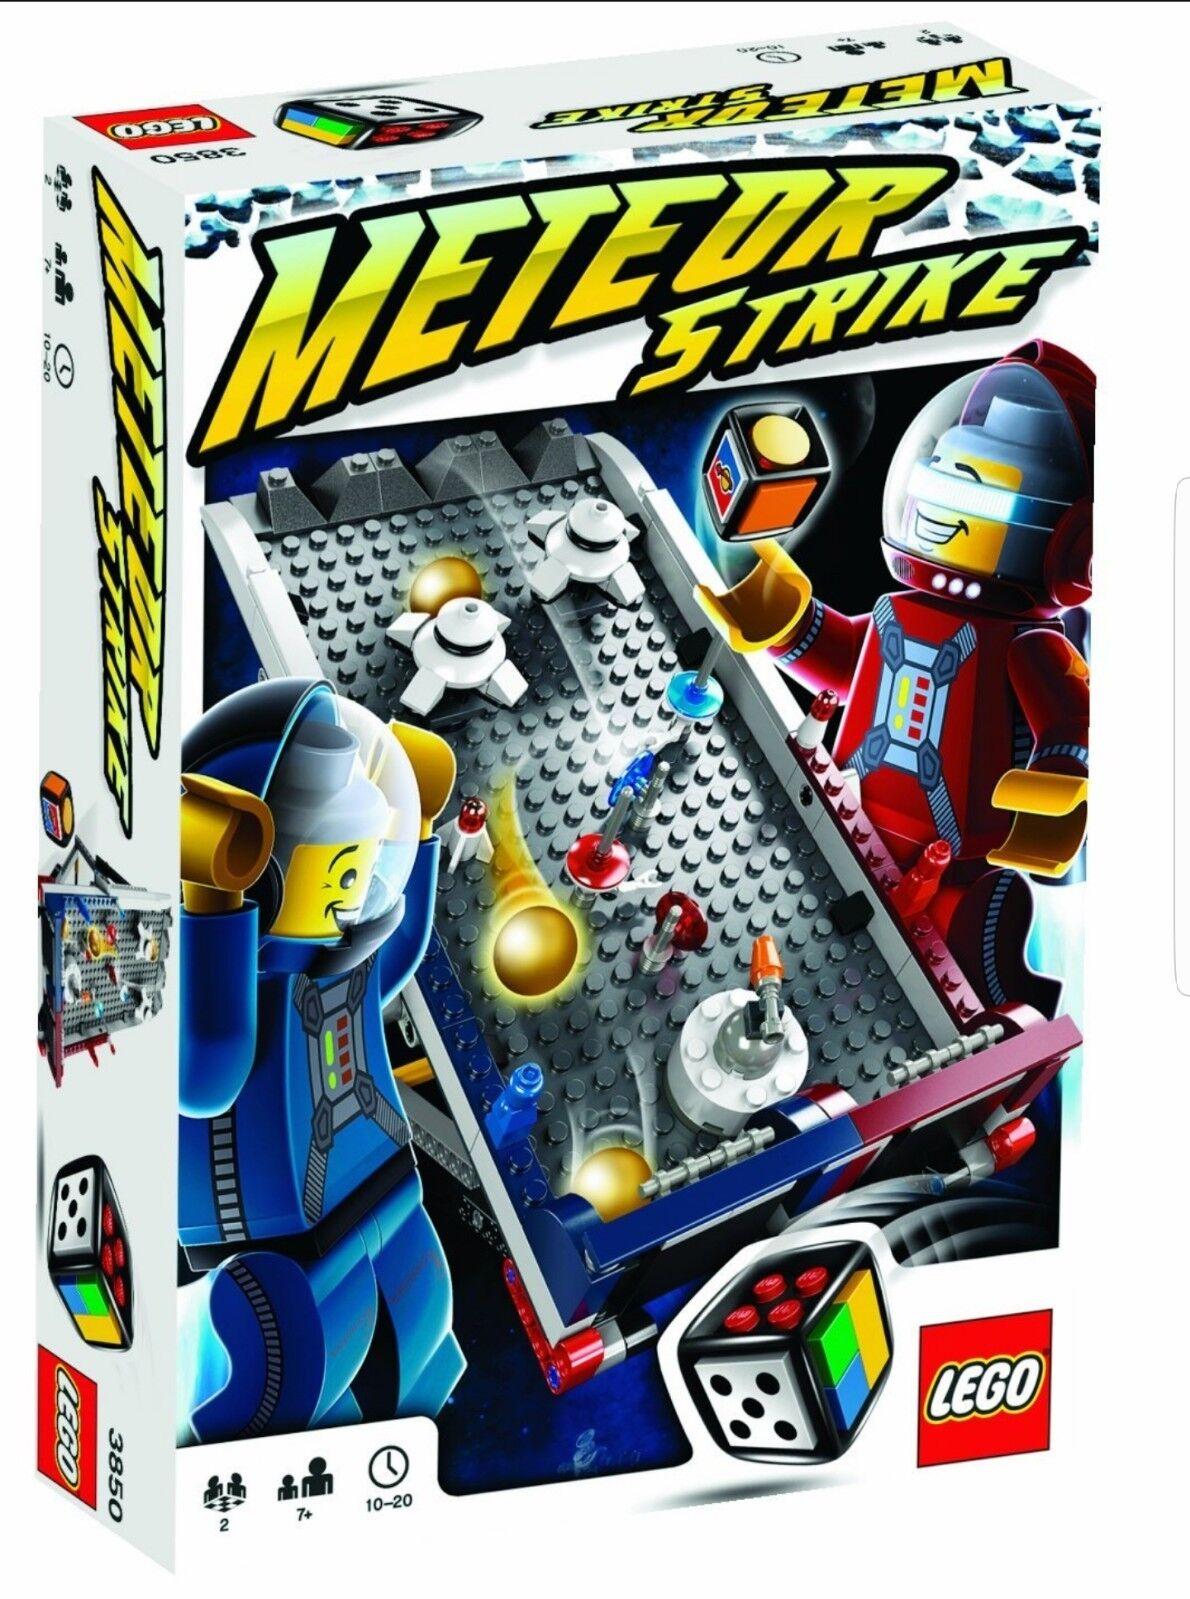 LEGO Game 3850 Meteor Strike BINB SEALED